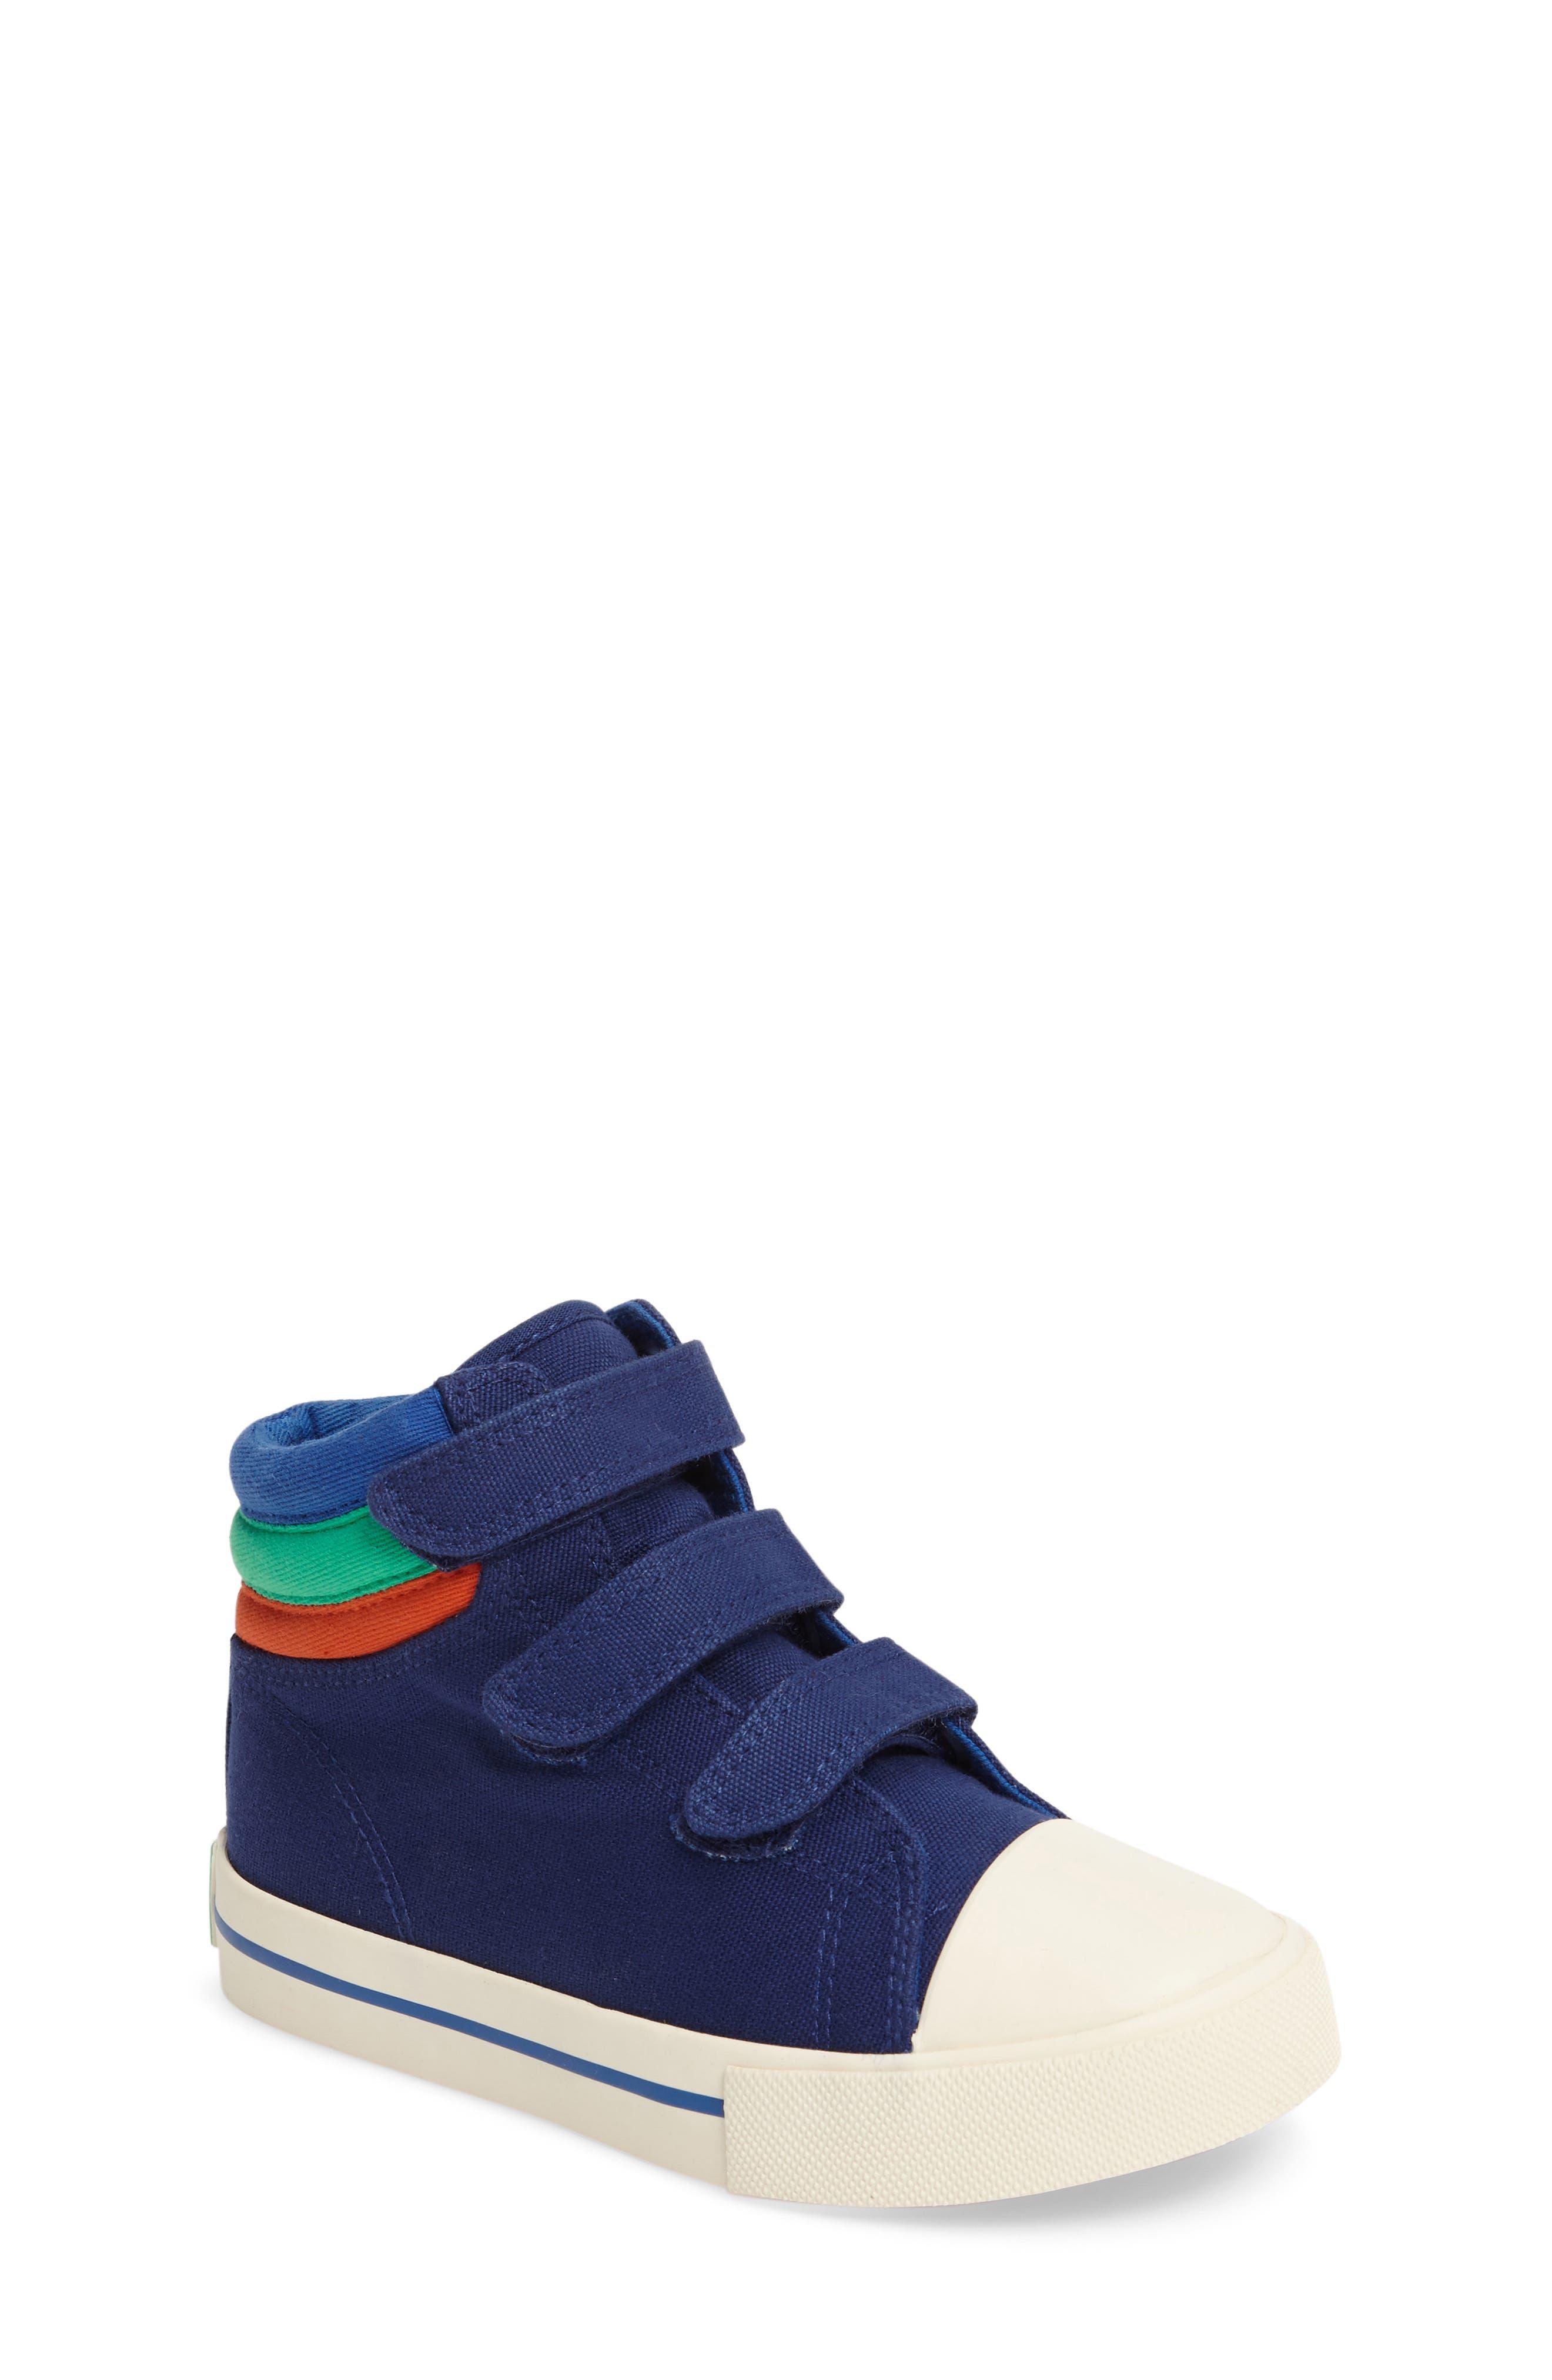 Main Image - Mini Boden High Top Sneaker (Toddler, Little Kid & Big Kid)